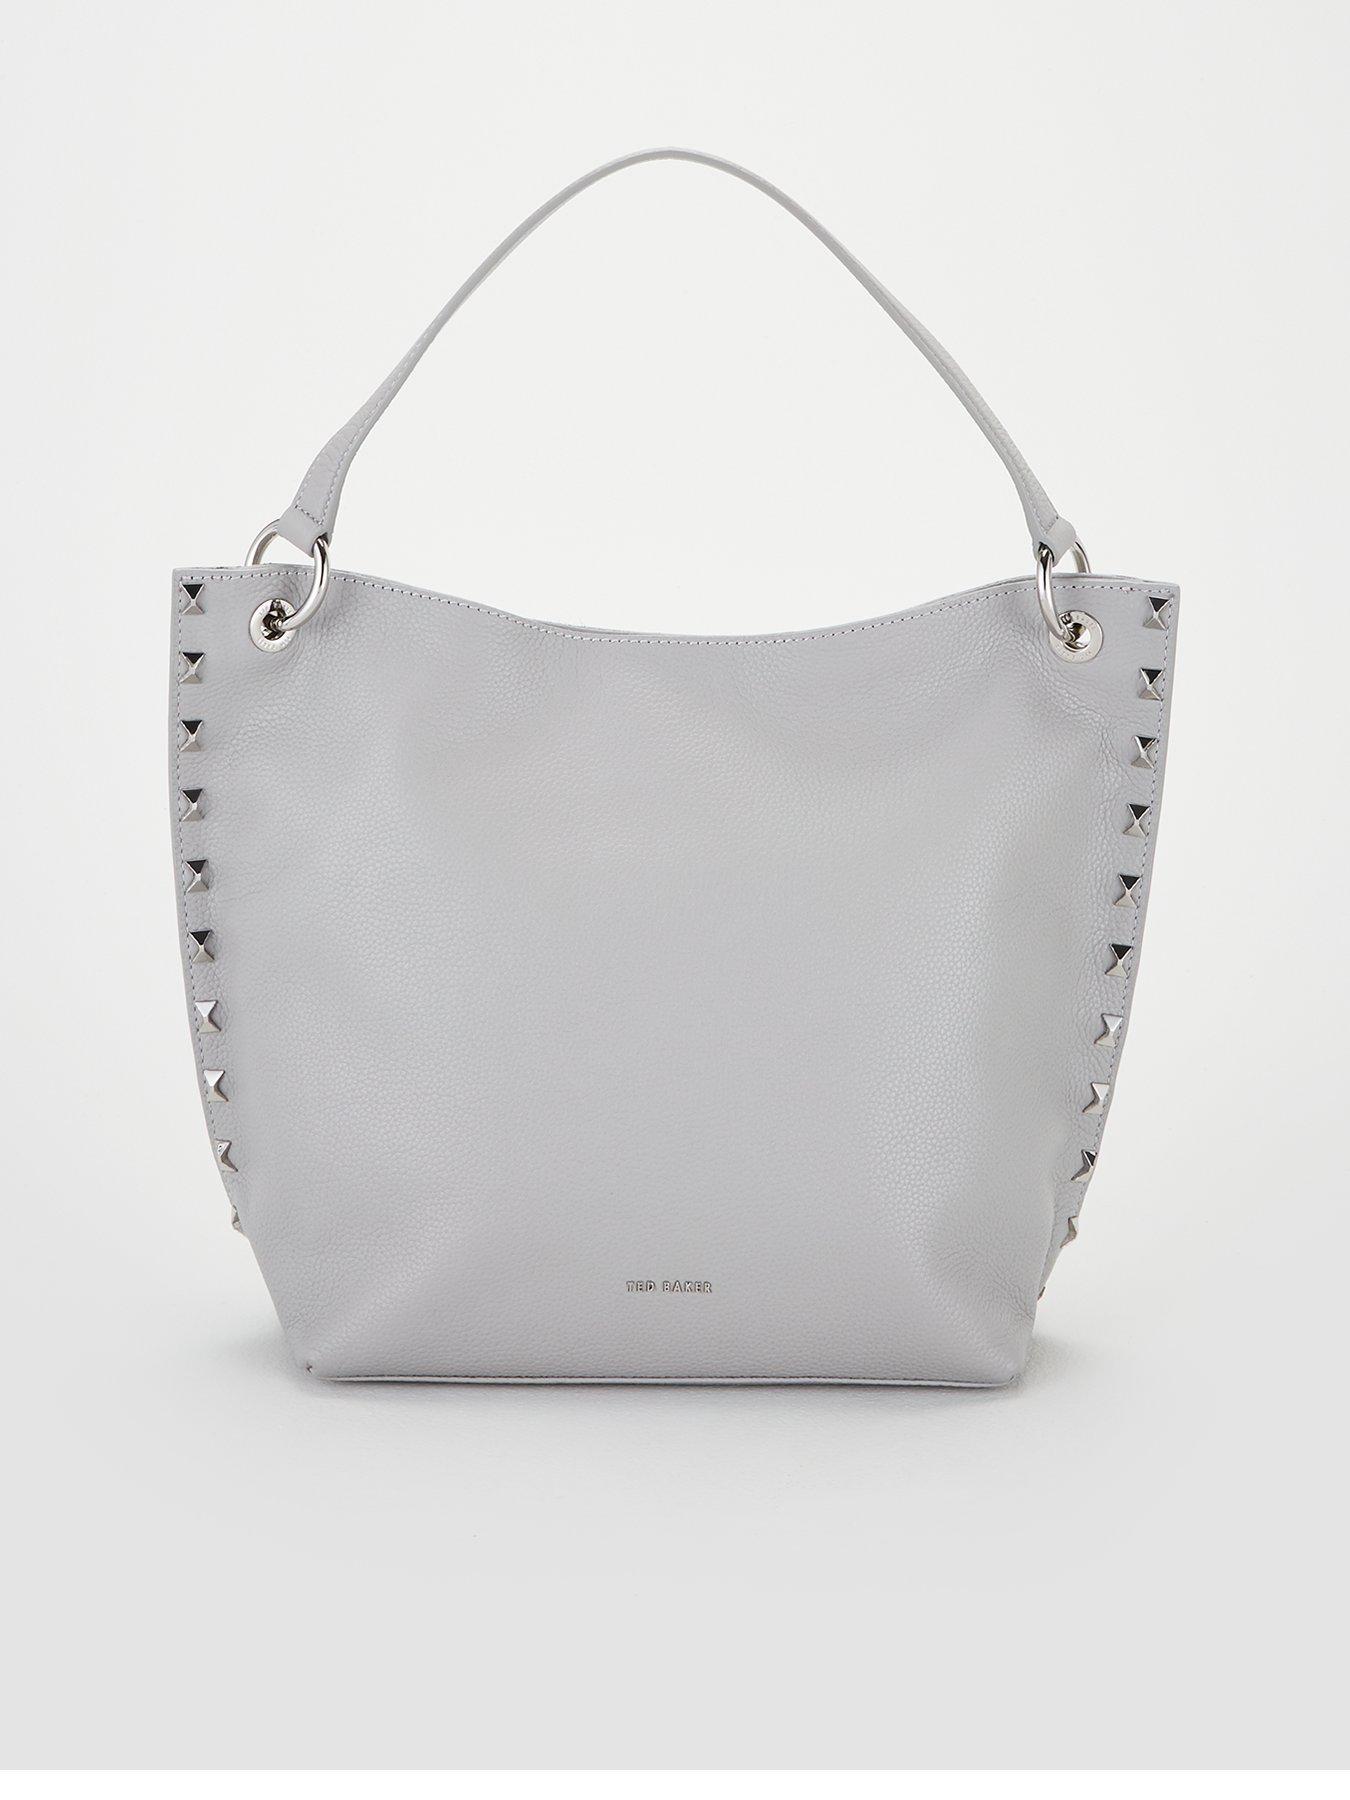 SINGKING Handbags Closing Easy Shawn-Mendes-Signature Drawstring Bags for Women /& Men